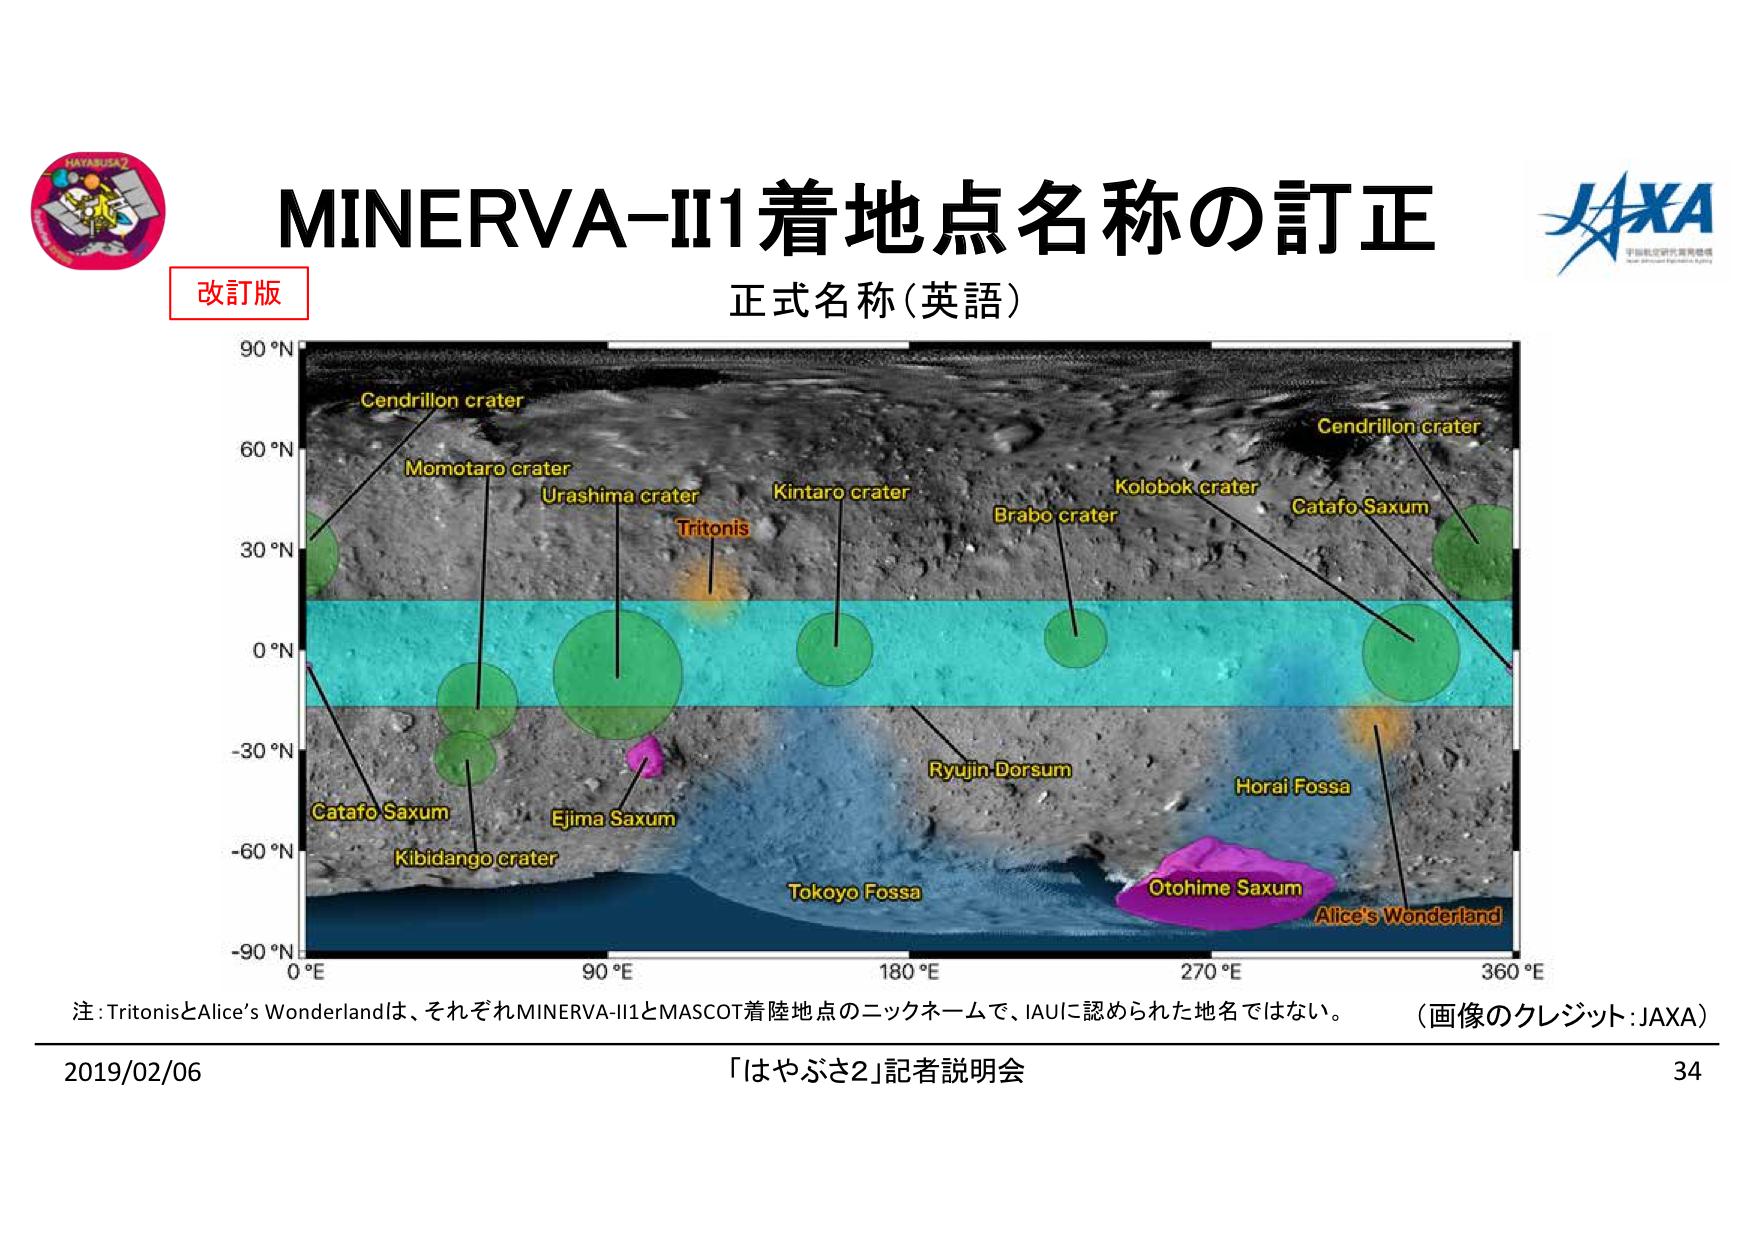 f:id:Imamura:20190204175528p:plain